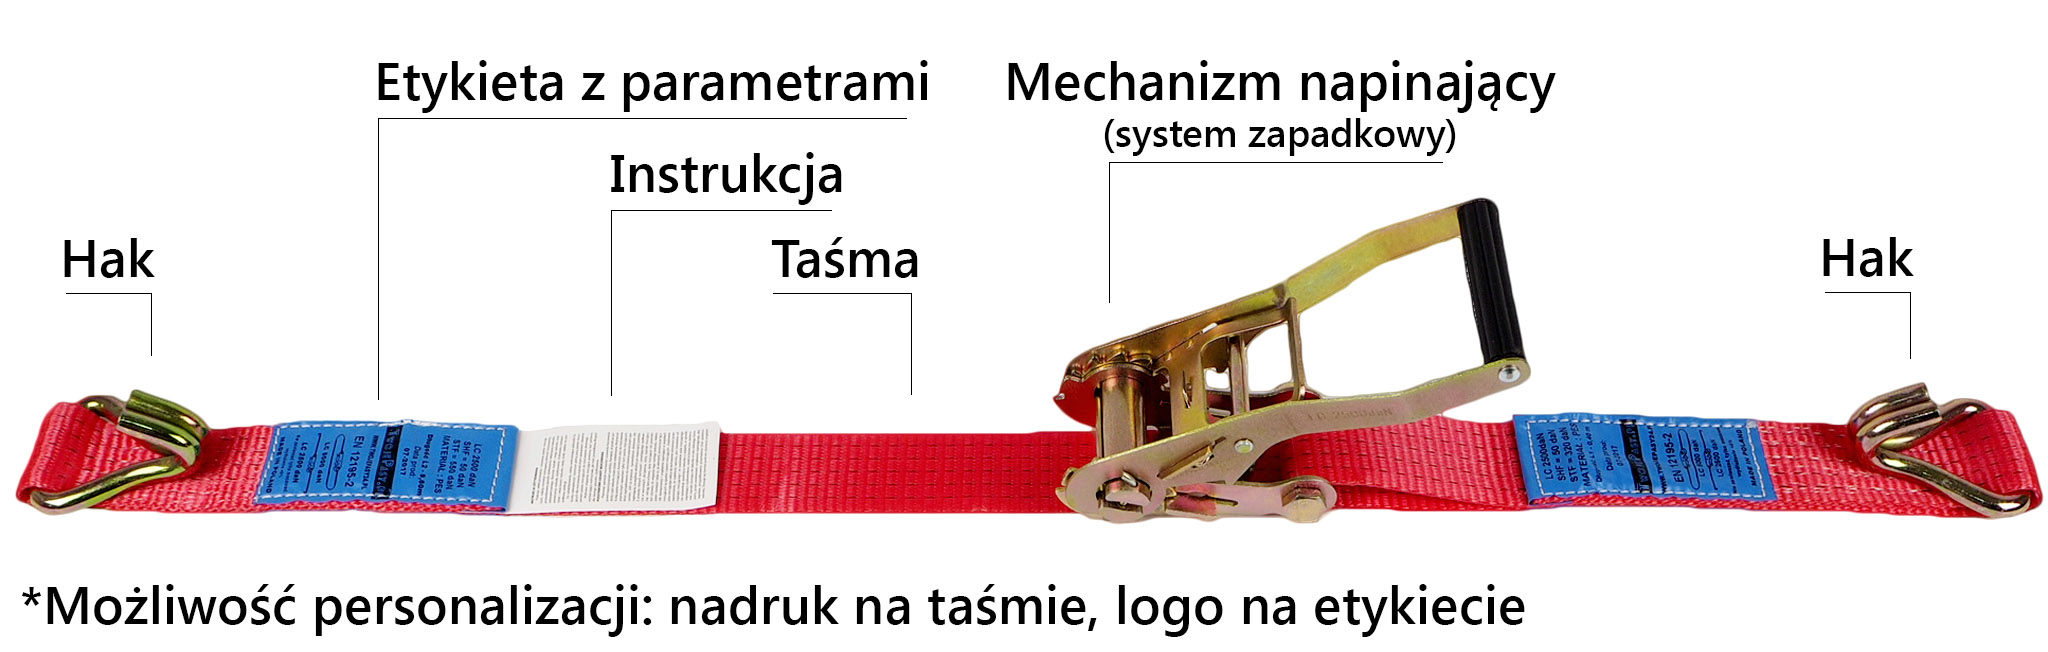 Pas transportowy 4 tony 320 daN